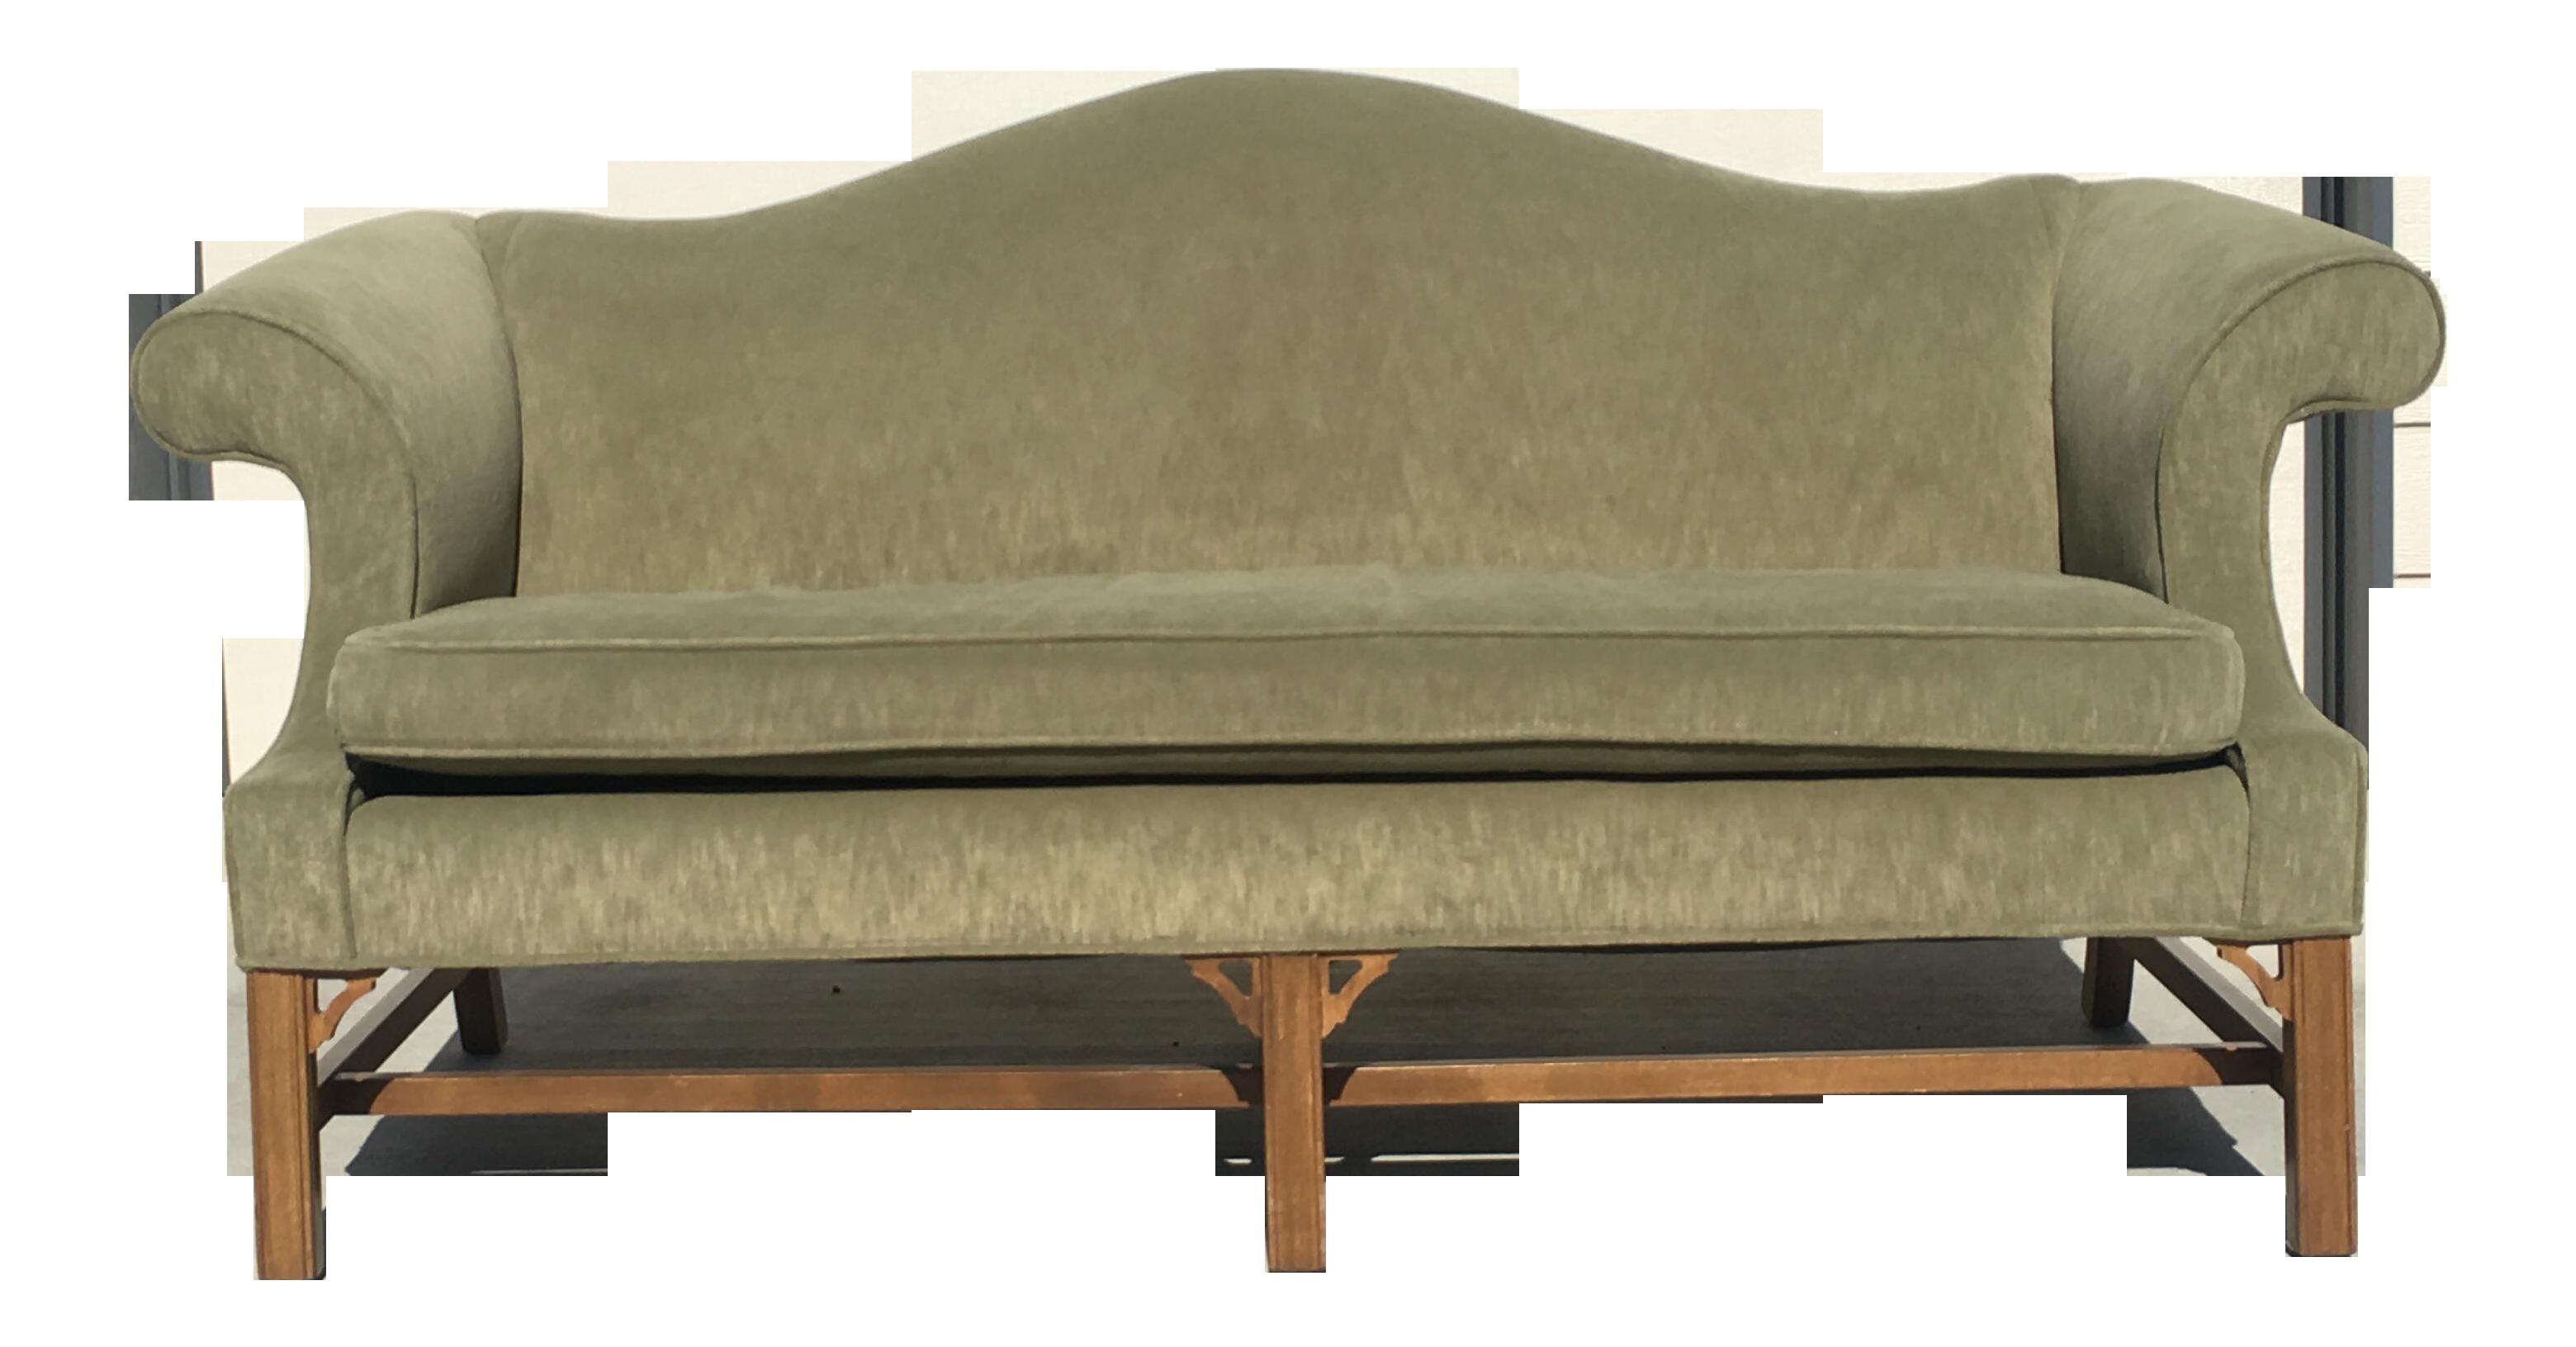 vintage ethan allen chippendale style camel back sofa chairish rh chairish com chippendale camelback sofa for sale chippendale camelback sofa slipcovers